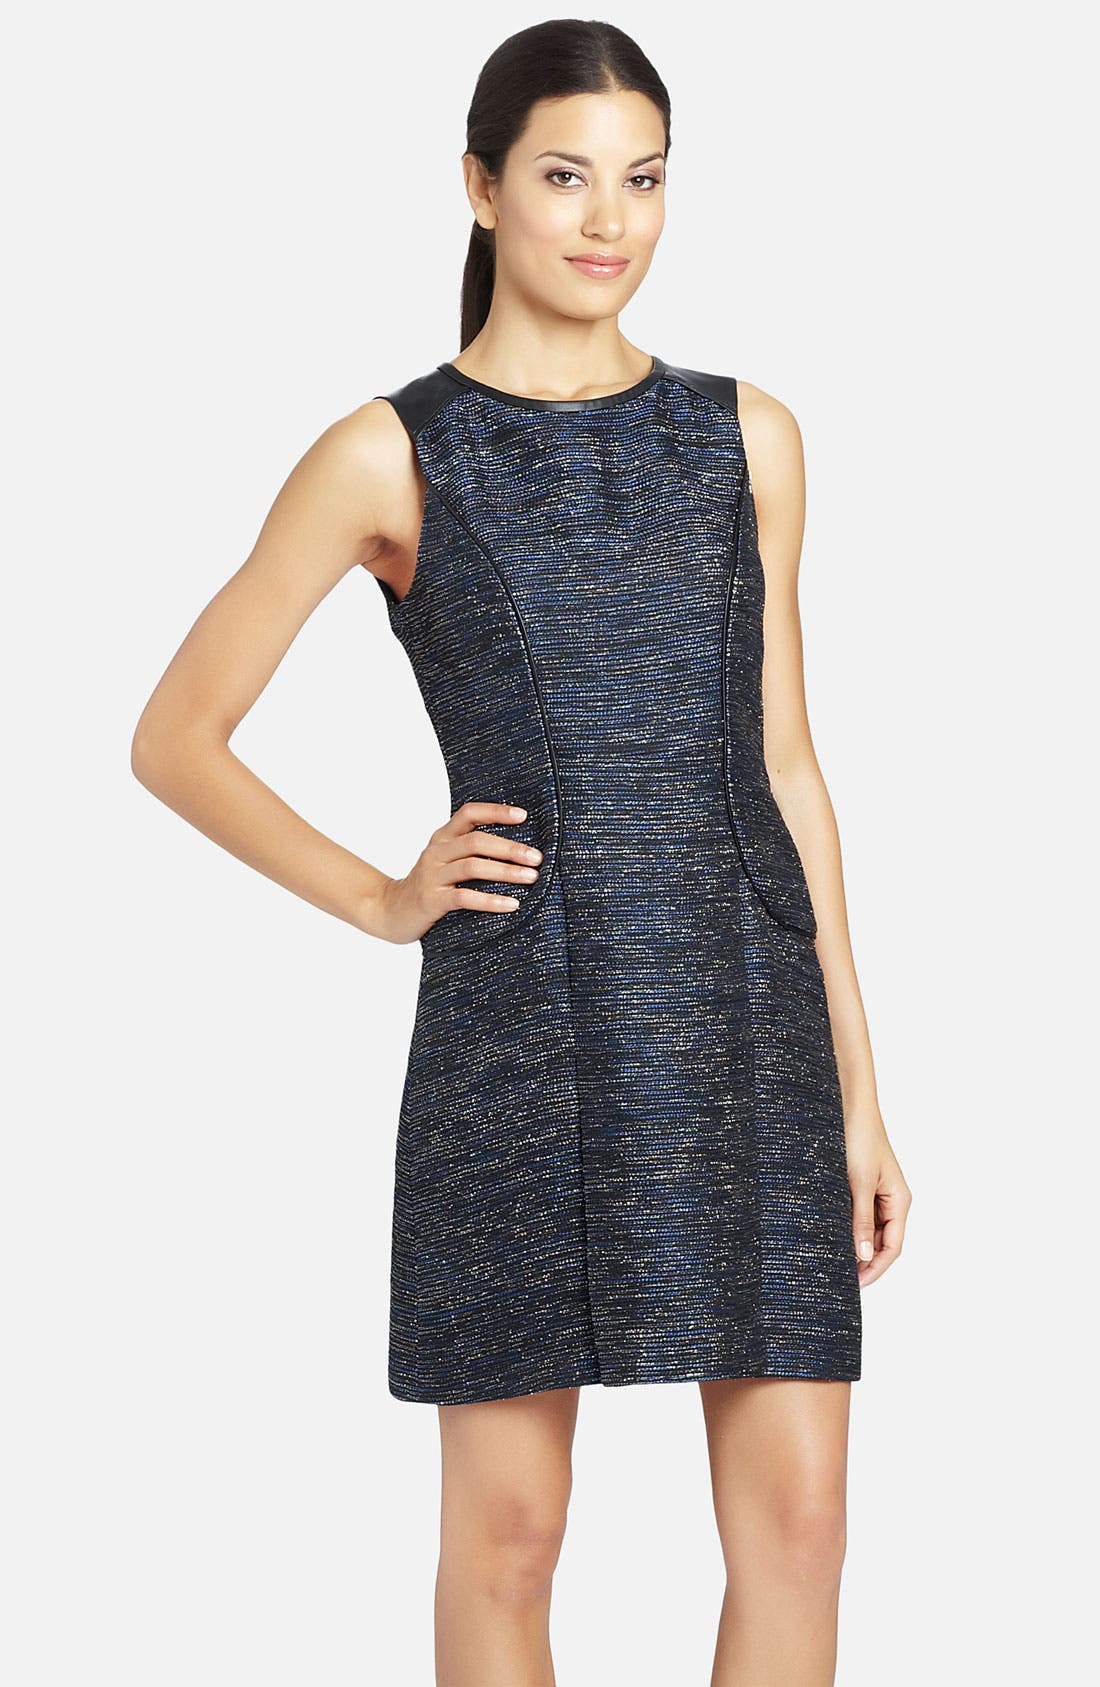 Main Image - Cynthia Steffe 'Blair' Faux-Leather Piping Metallic Woven Dress